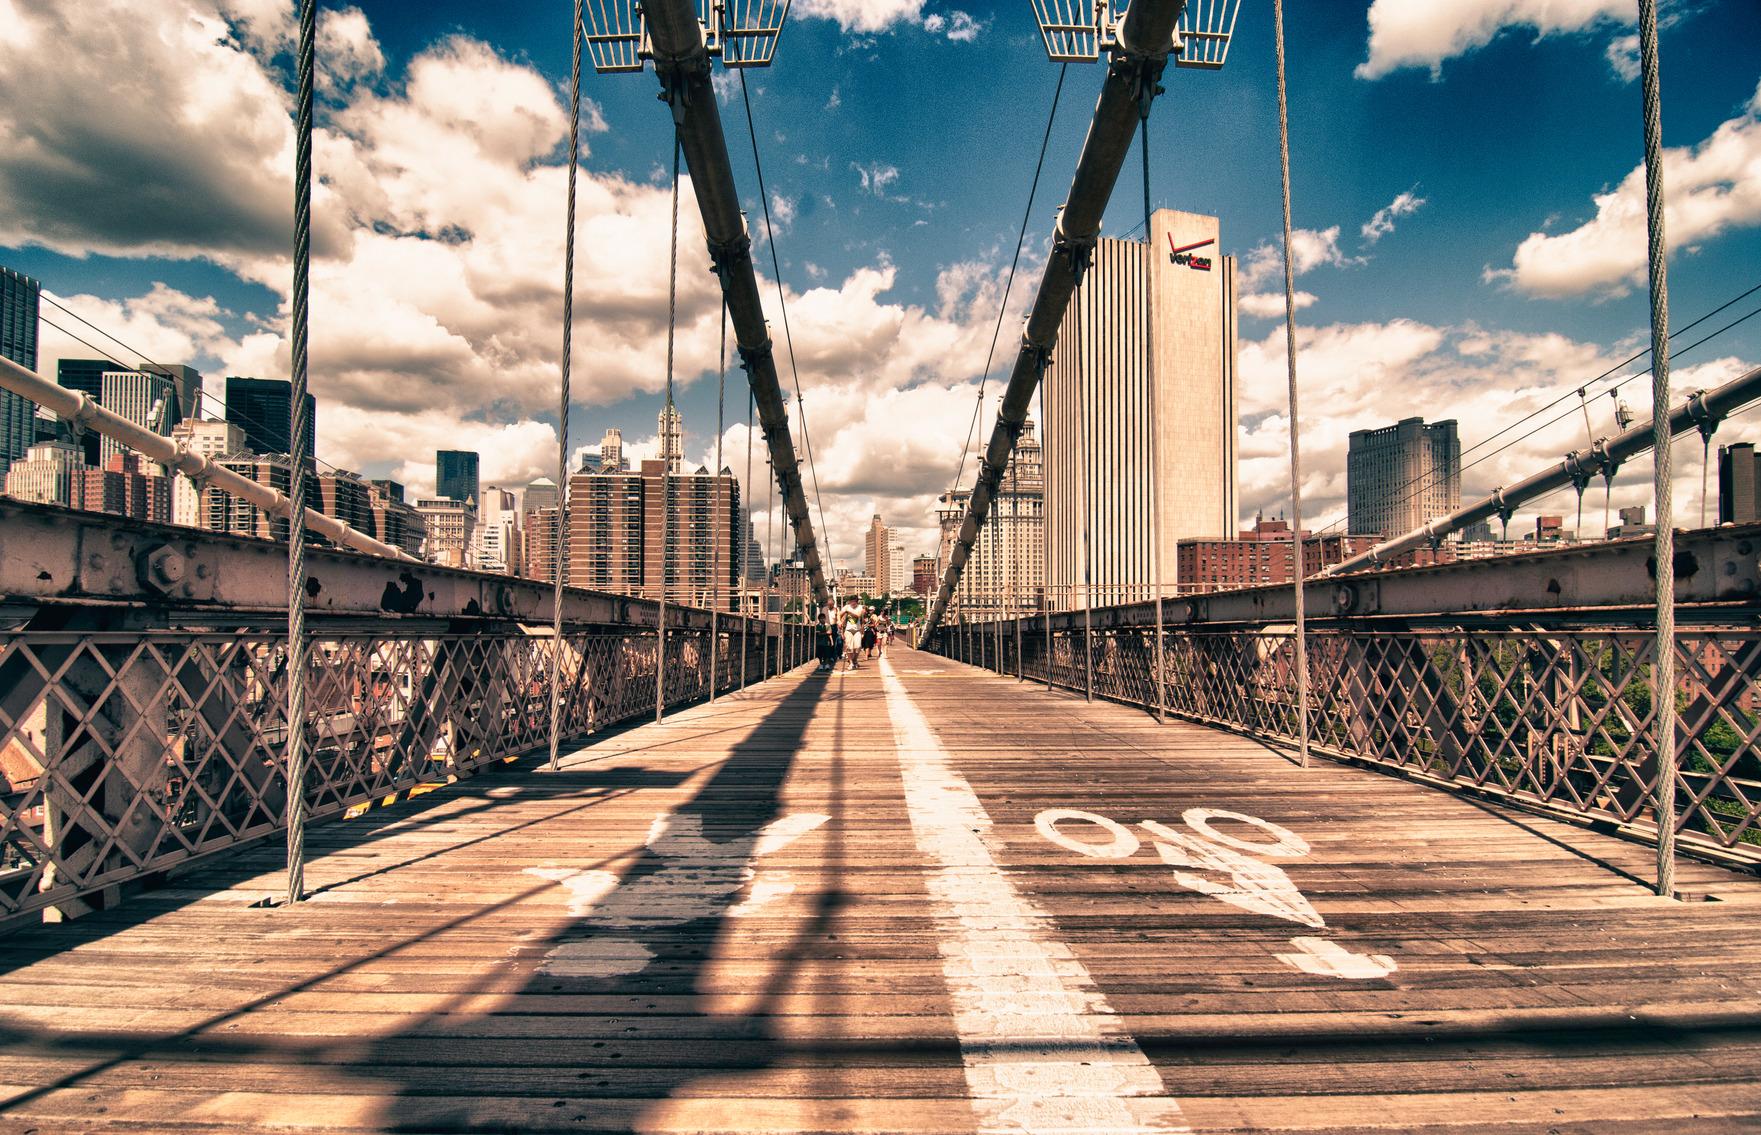 Brooklyn Bridge view in New York City, U.S.A.